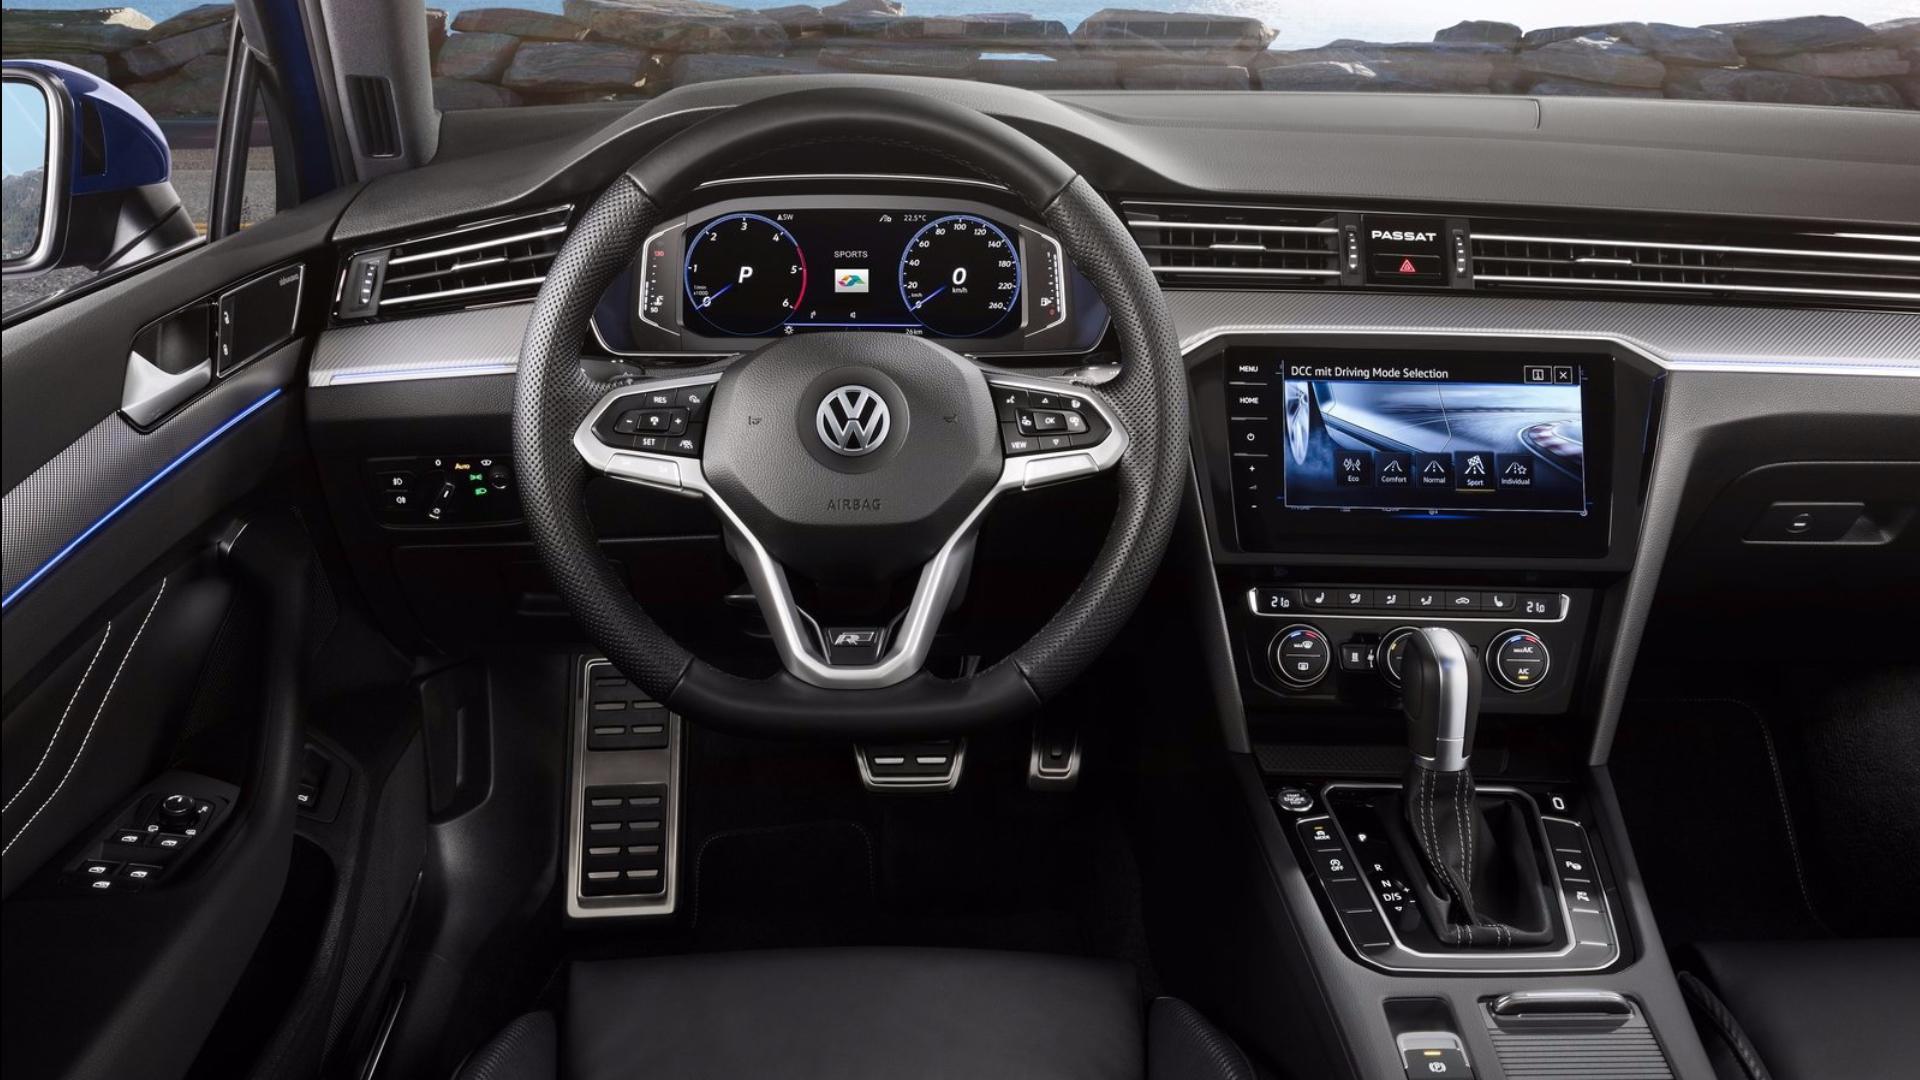 Volkswagen Passat Recenze A Ceny Carismo Cz